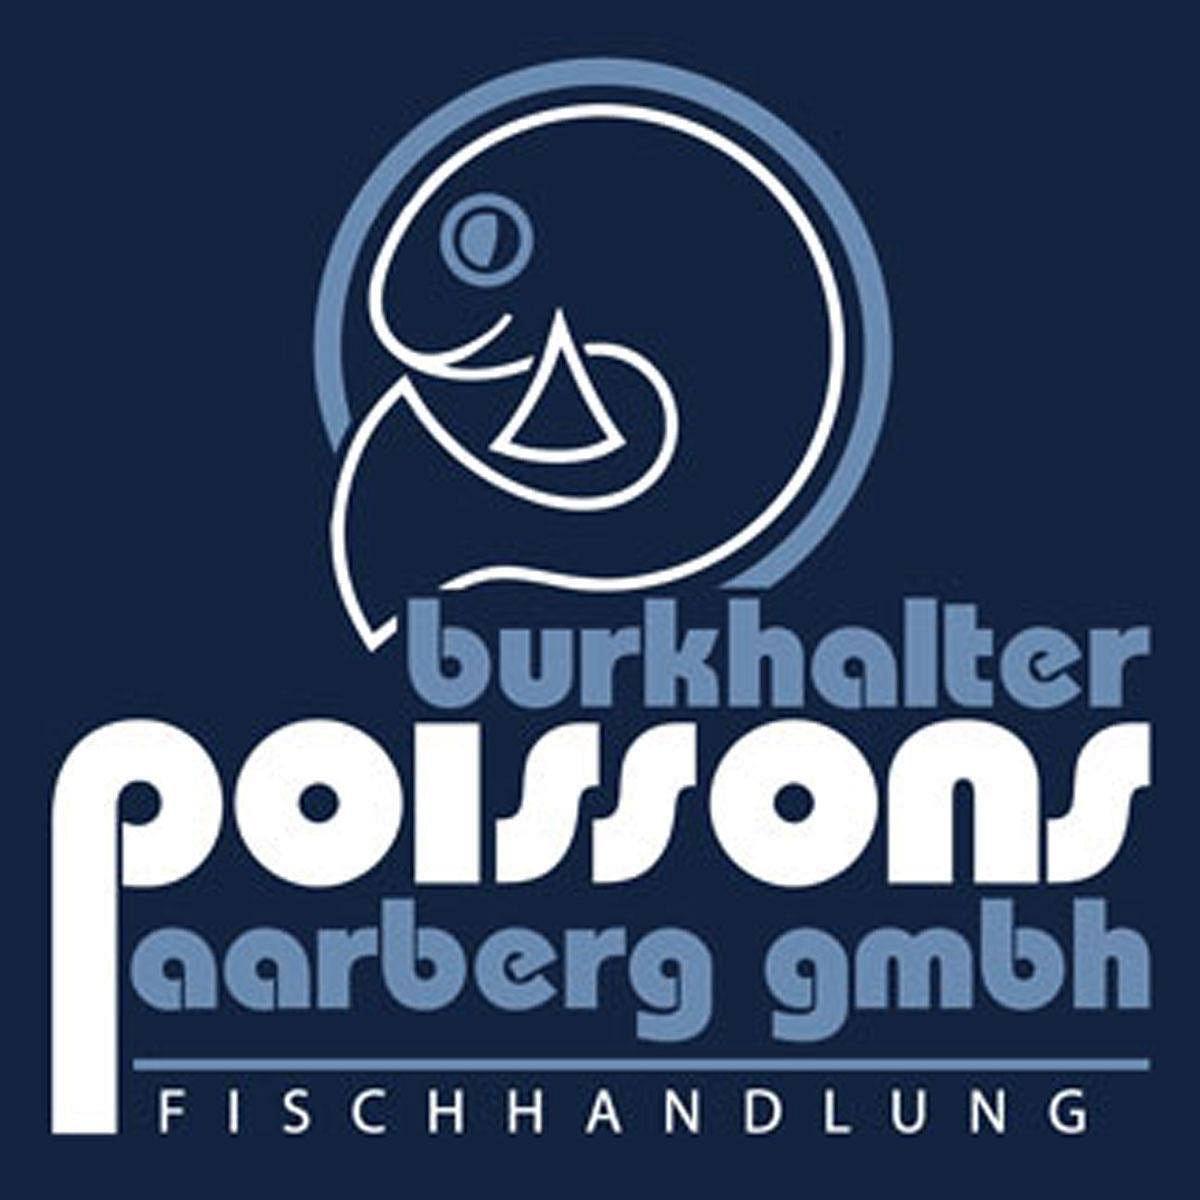 Burkhalter Poissons Aarberg GmbH